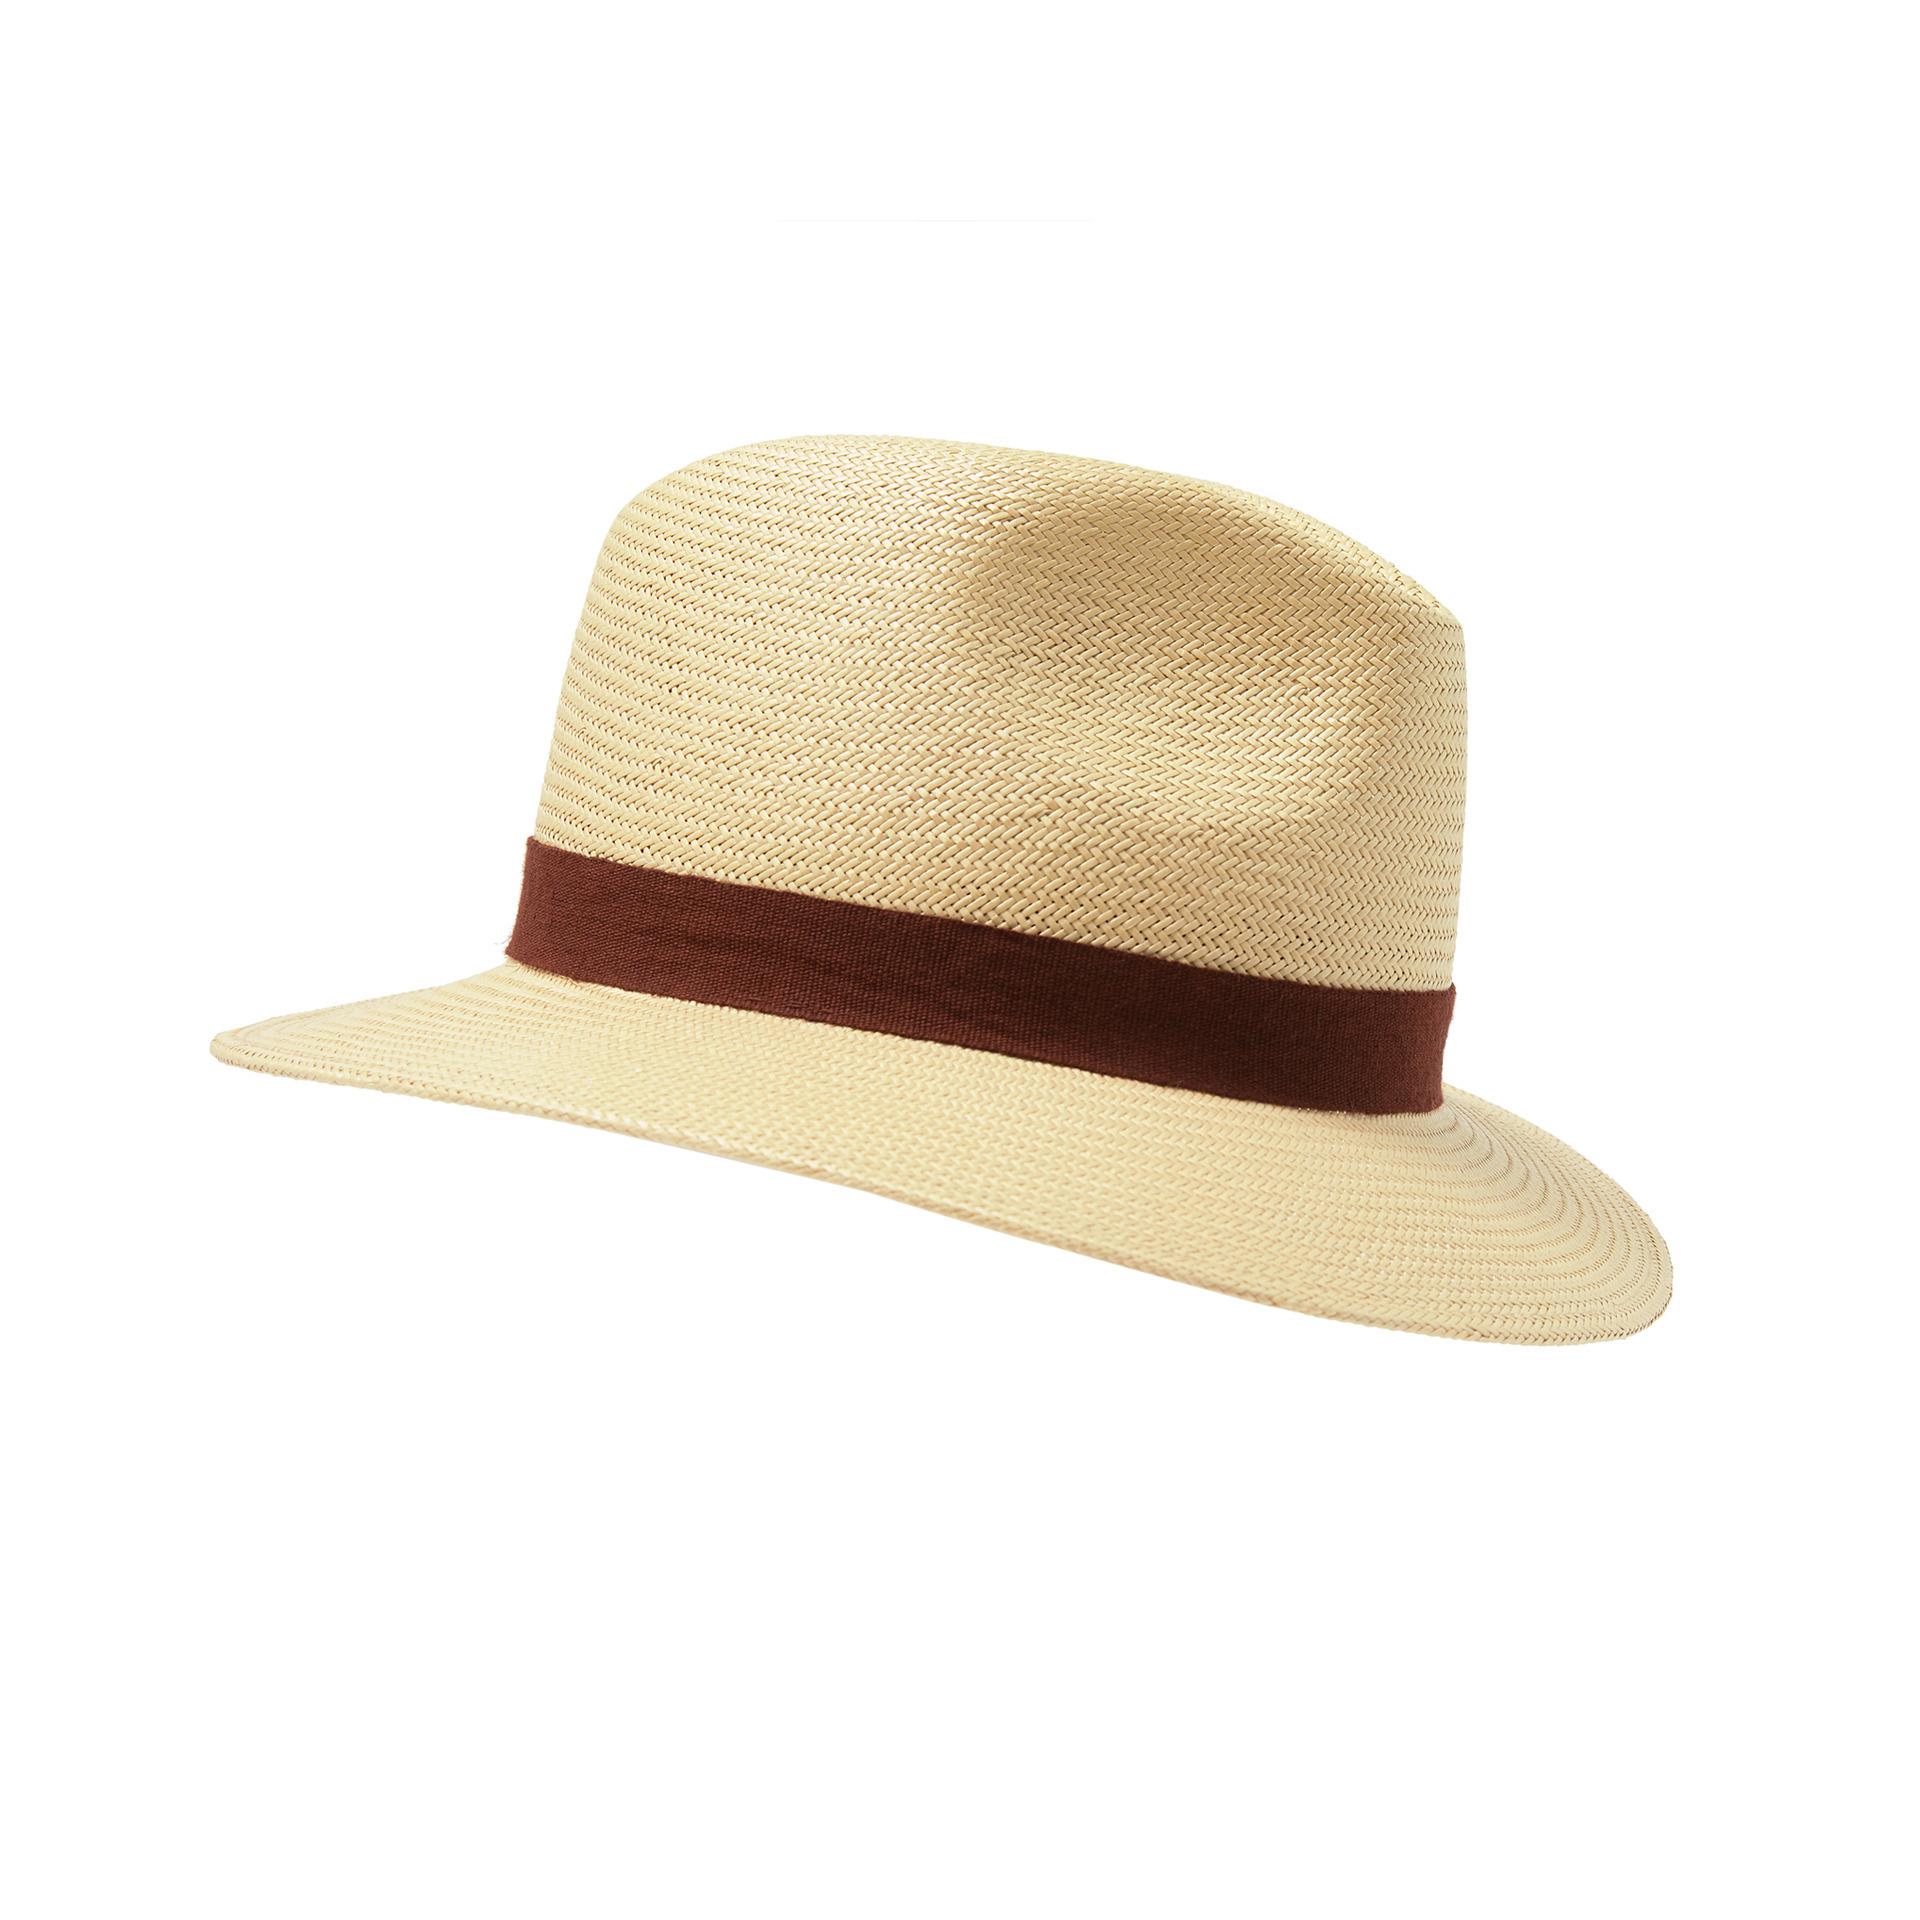 Sombrero Panamá de Bimba & Lola